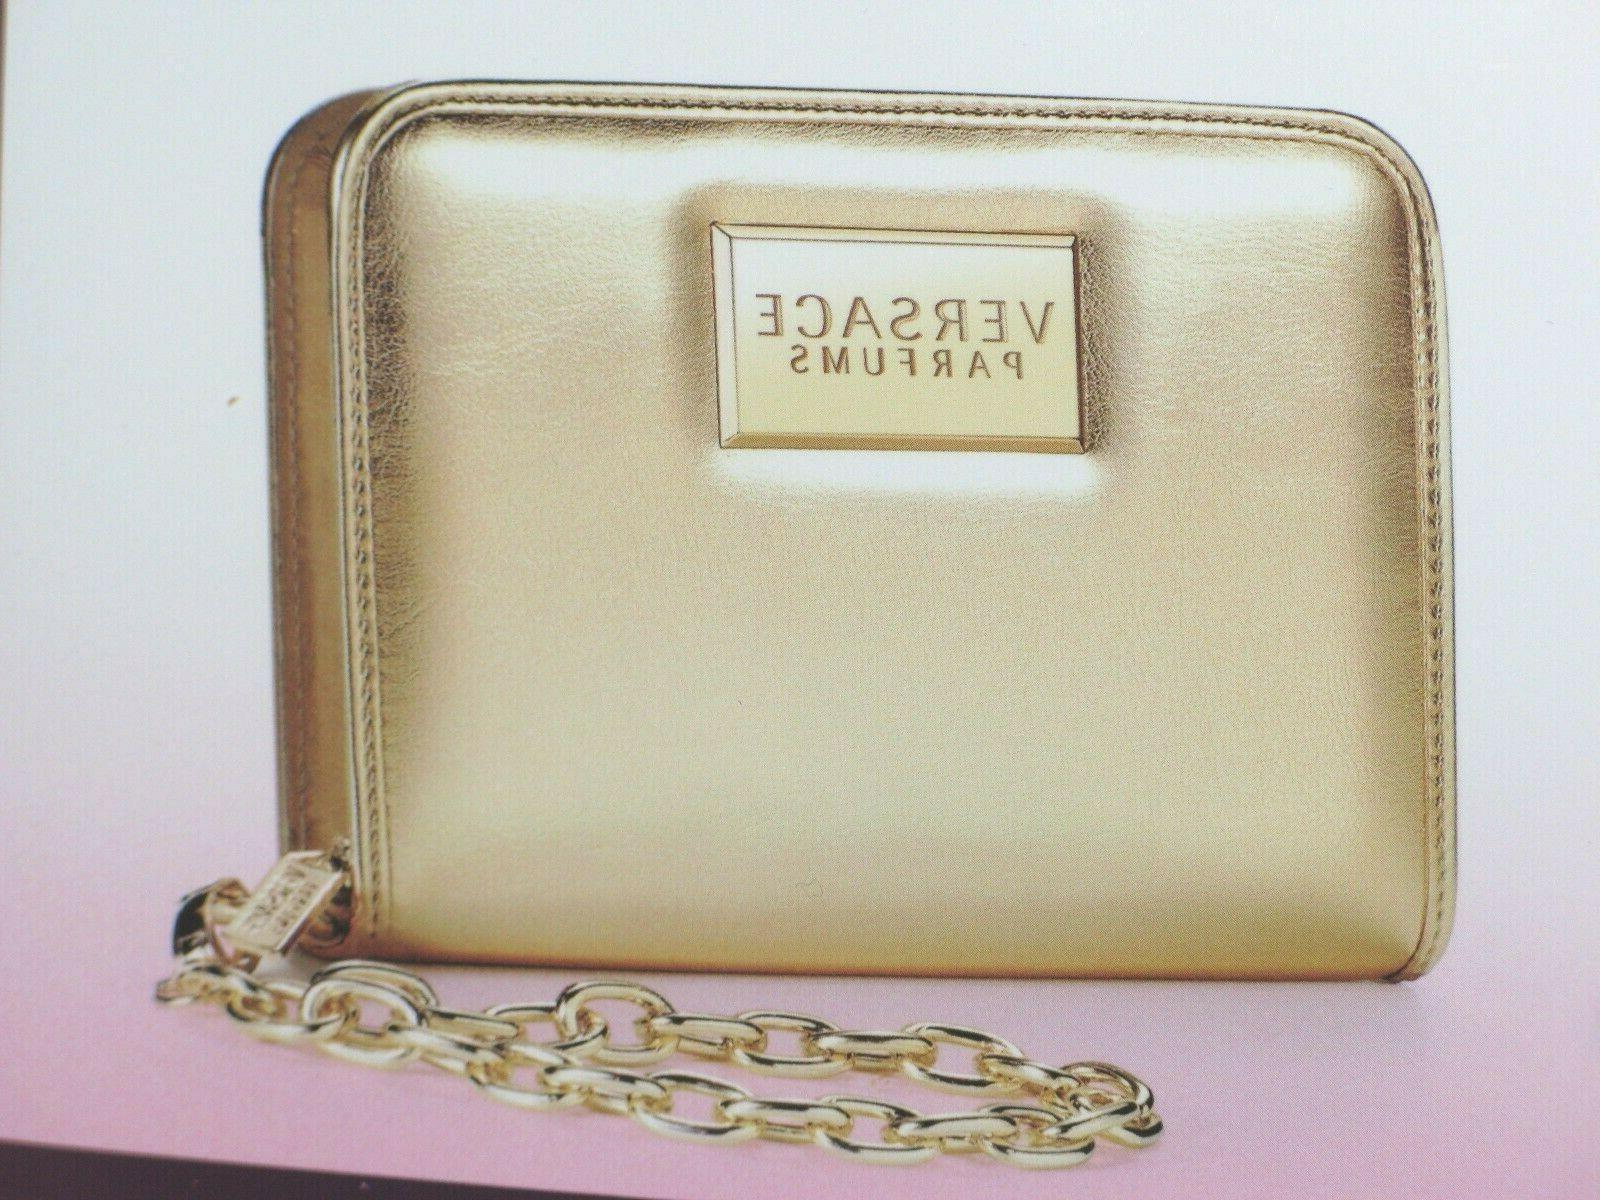 Versace EDT Lotion 3.4 oz Gift Set